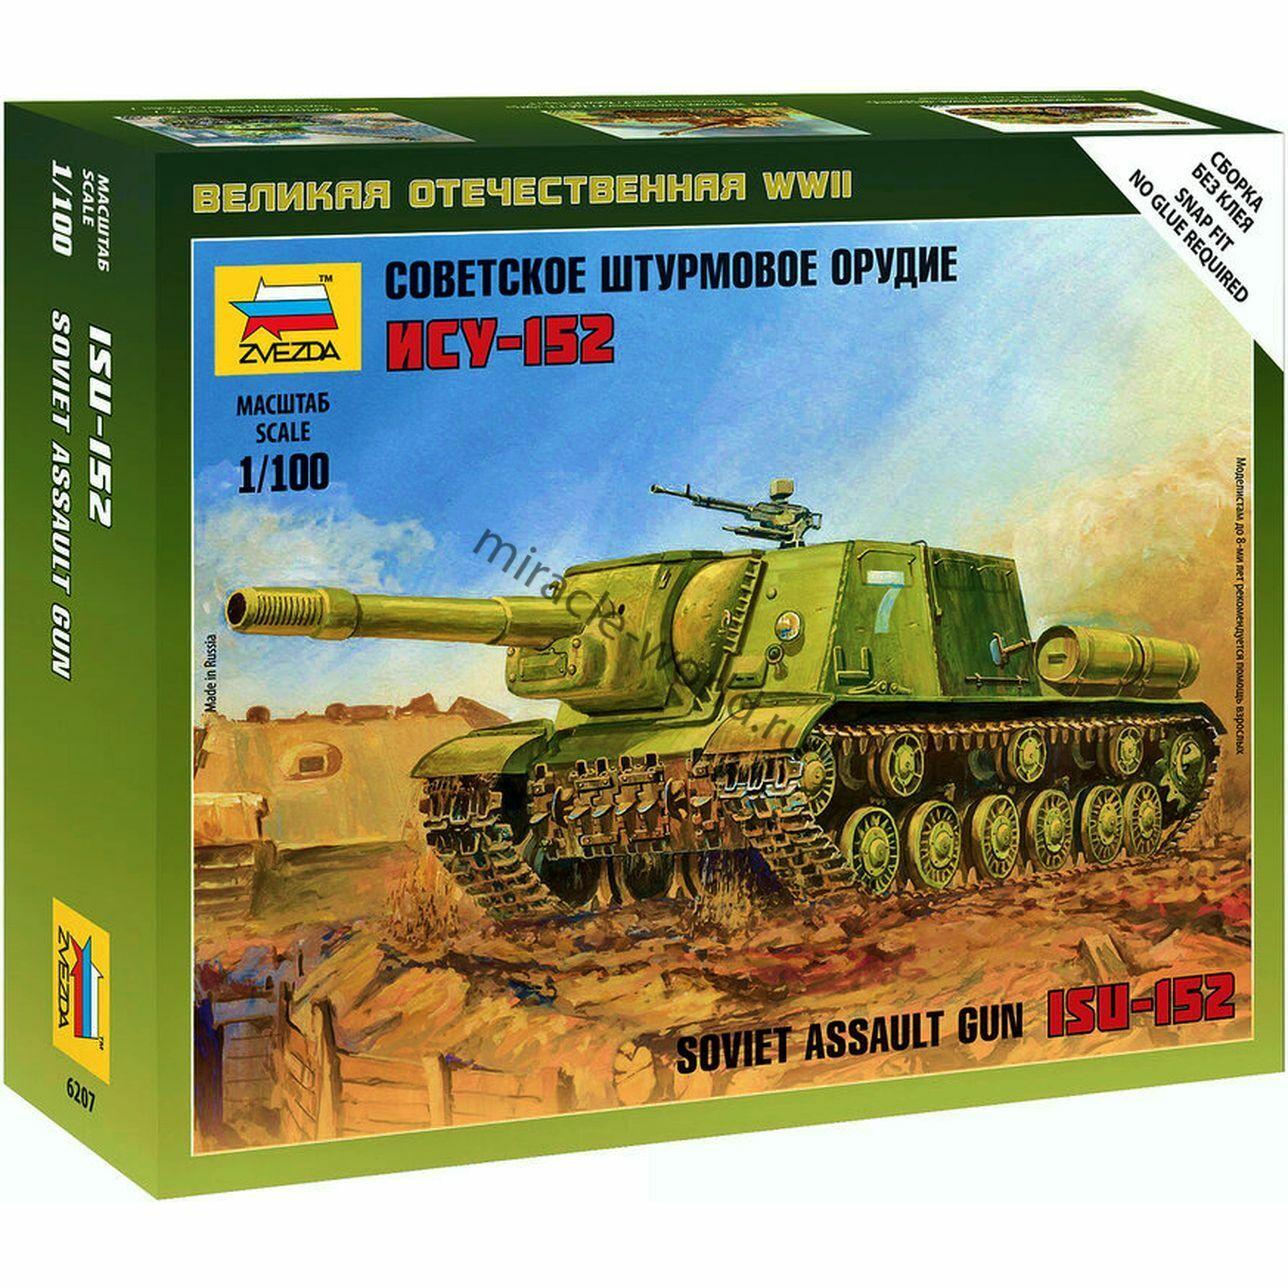 Zvezda #6207-1:100  Soviet Assault Gun ISU-152